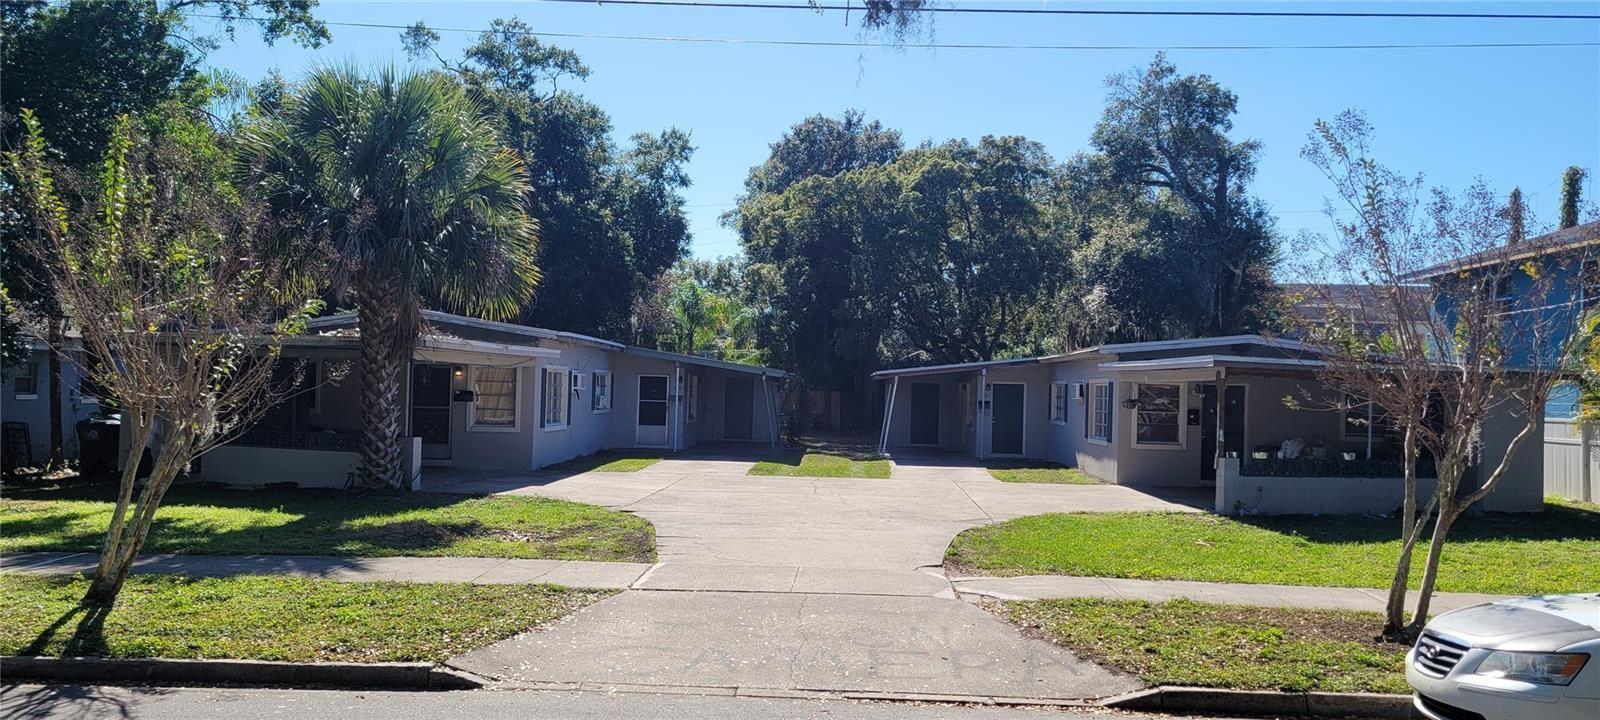 126 E HARDING STREET, Orlando, FL 32806 - MLS#: O5958203